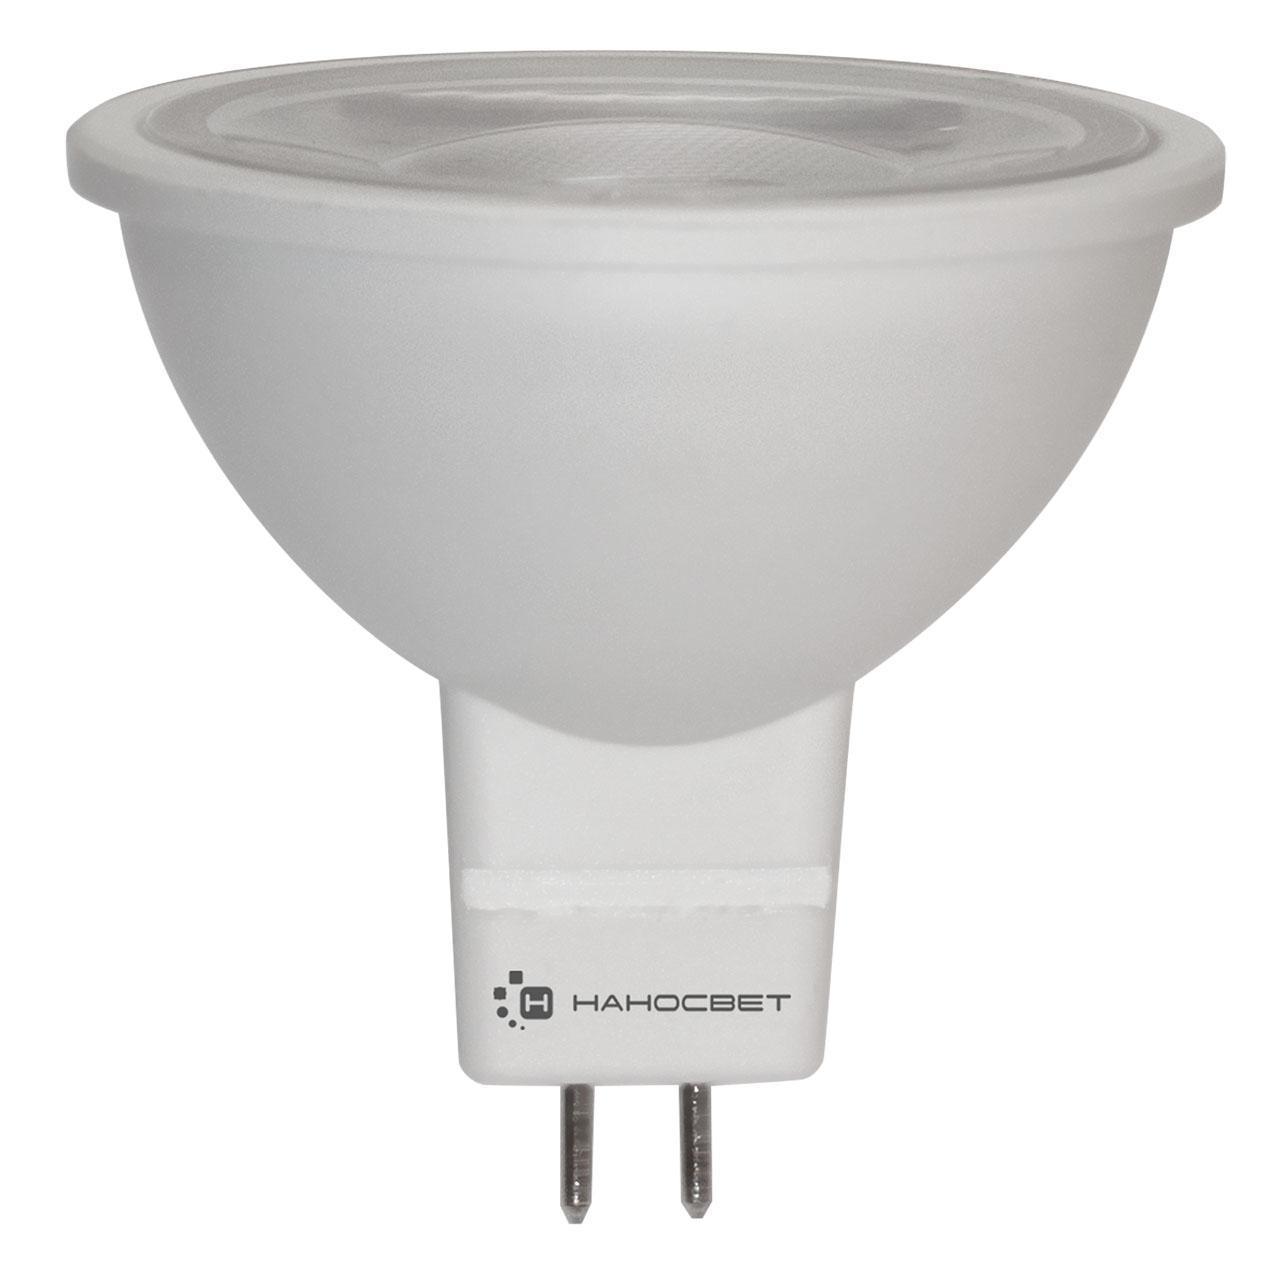 Лампа светодиодная GU5.3 8,5W 4000K прозрачная LH-MR16-8.5/GU5.3/840/12V L285 клаксон lh 8 12v s8